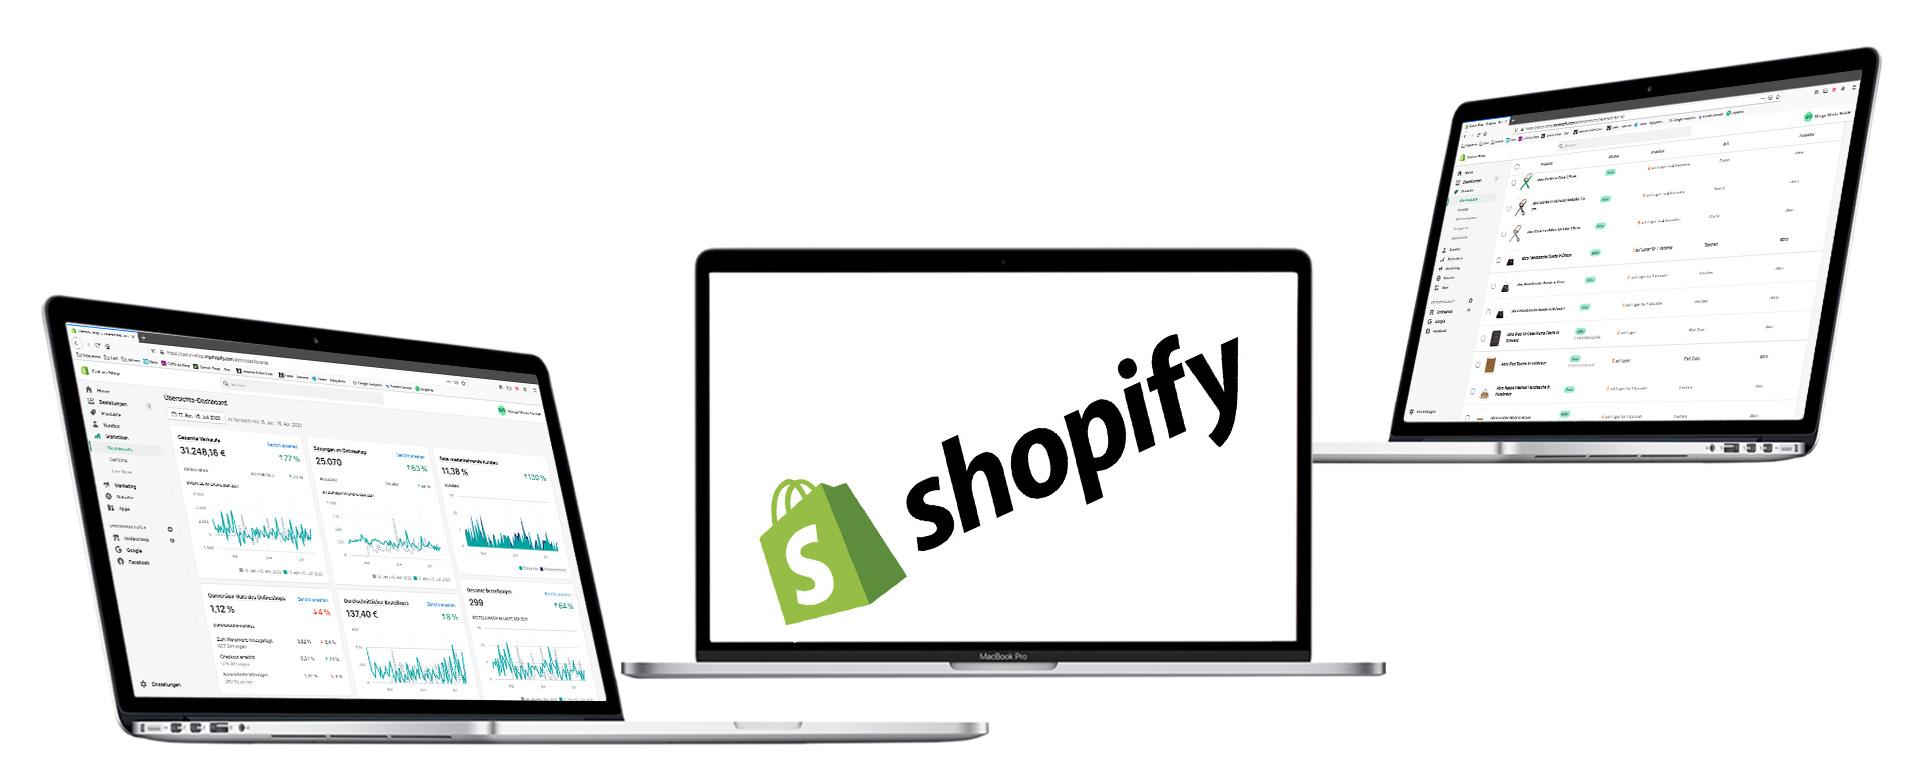 Shopify Fulfillment